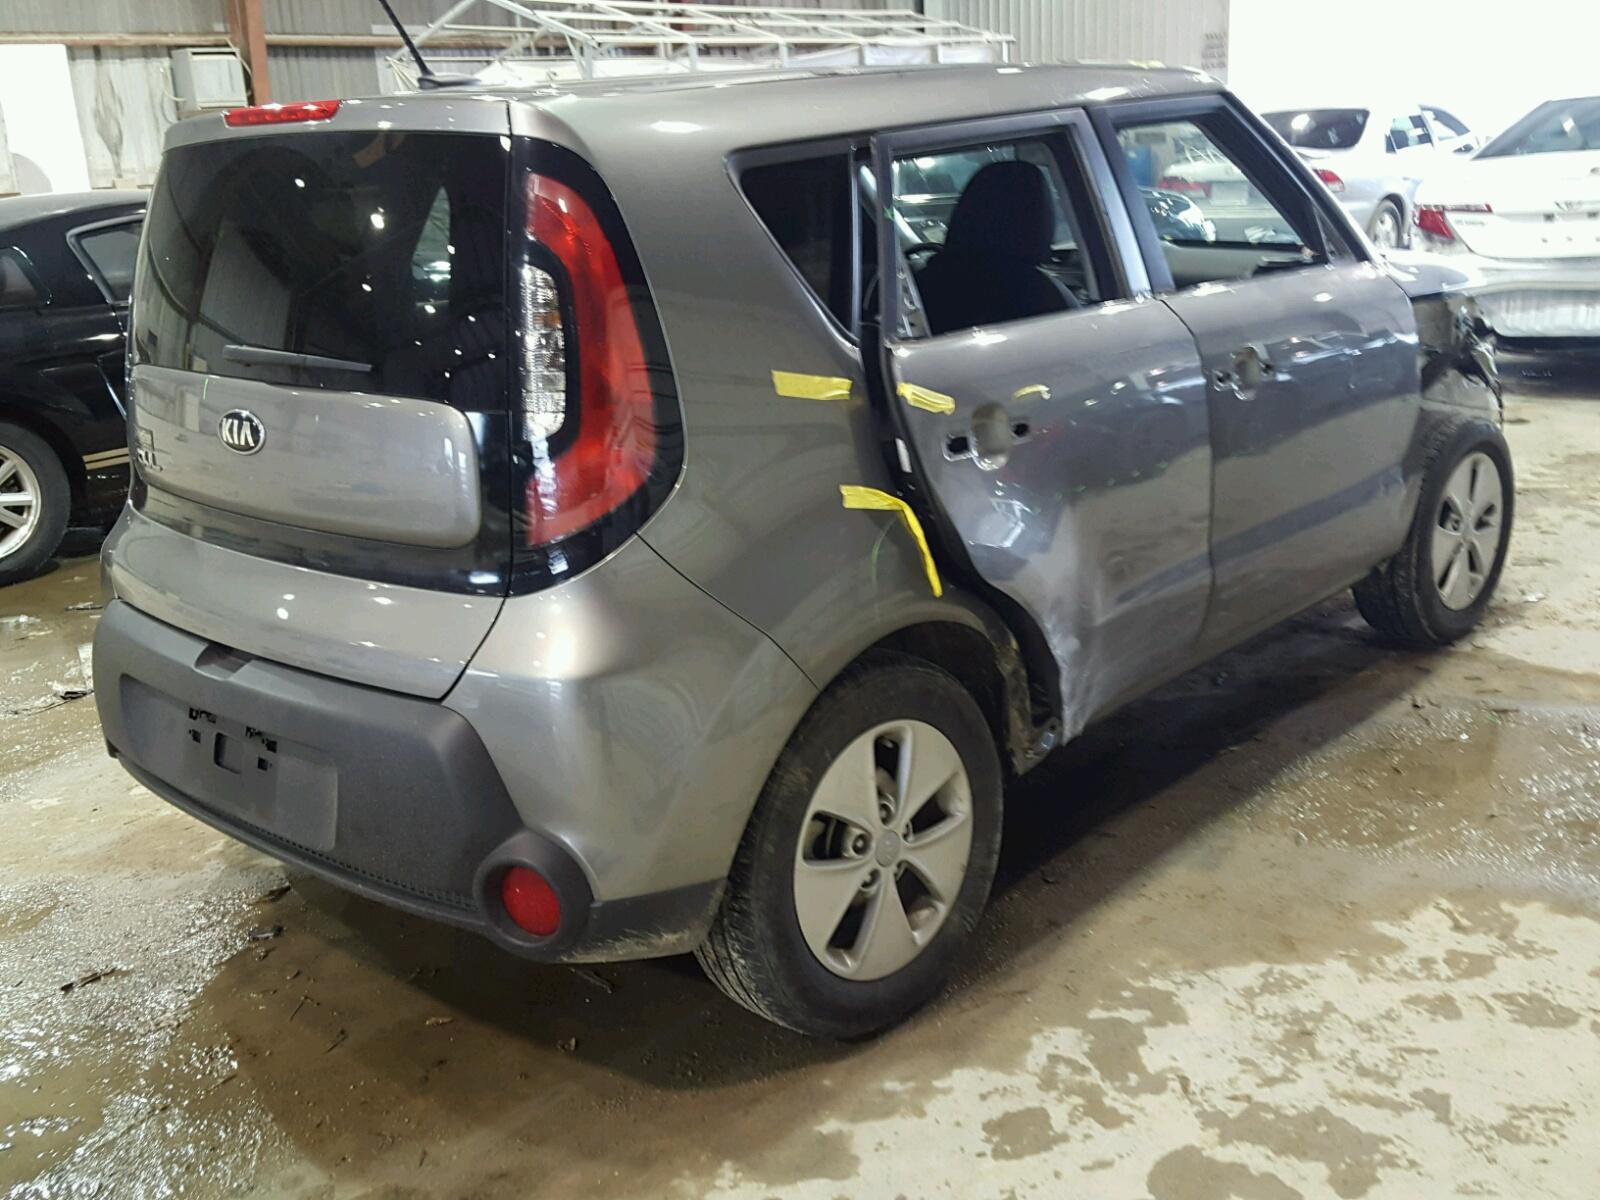 kia view cert baton auctions salvage lx in online of la auto white lot copart forte carfinder en left on sale rouge title